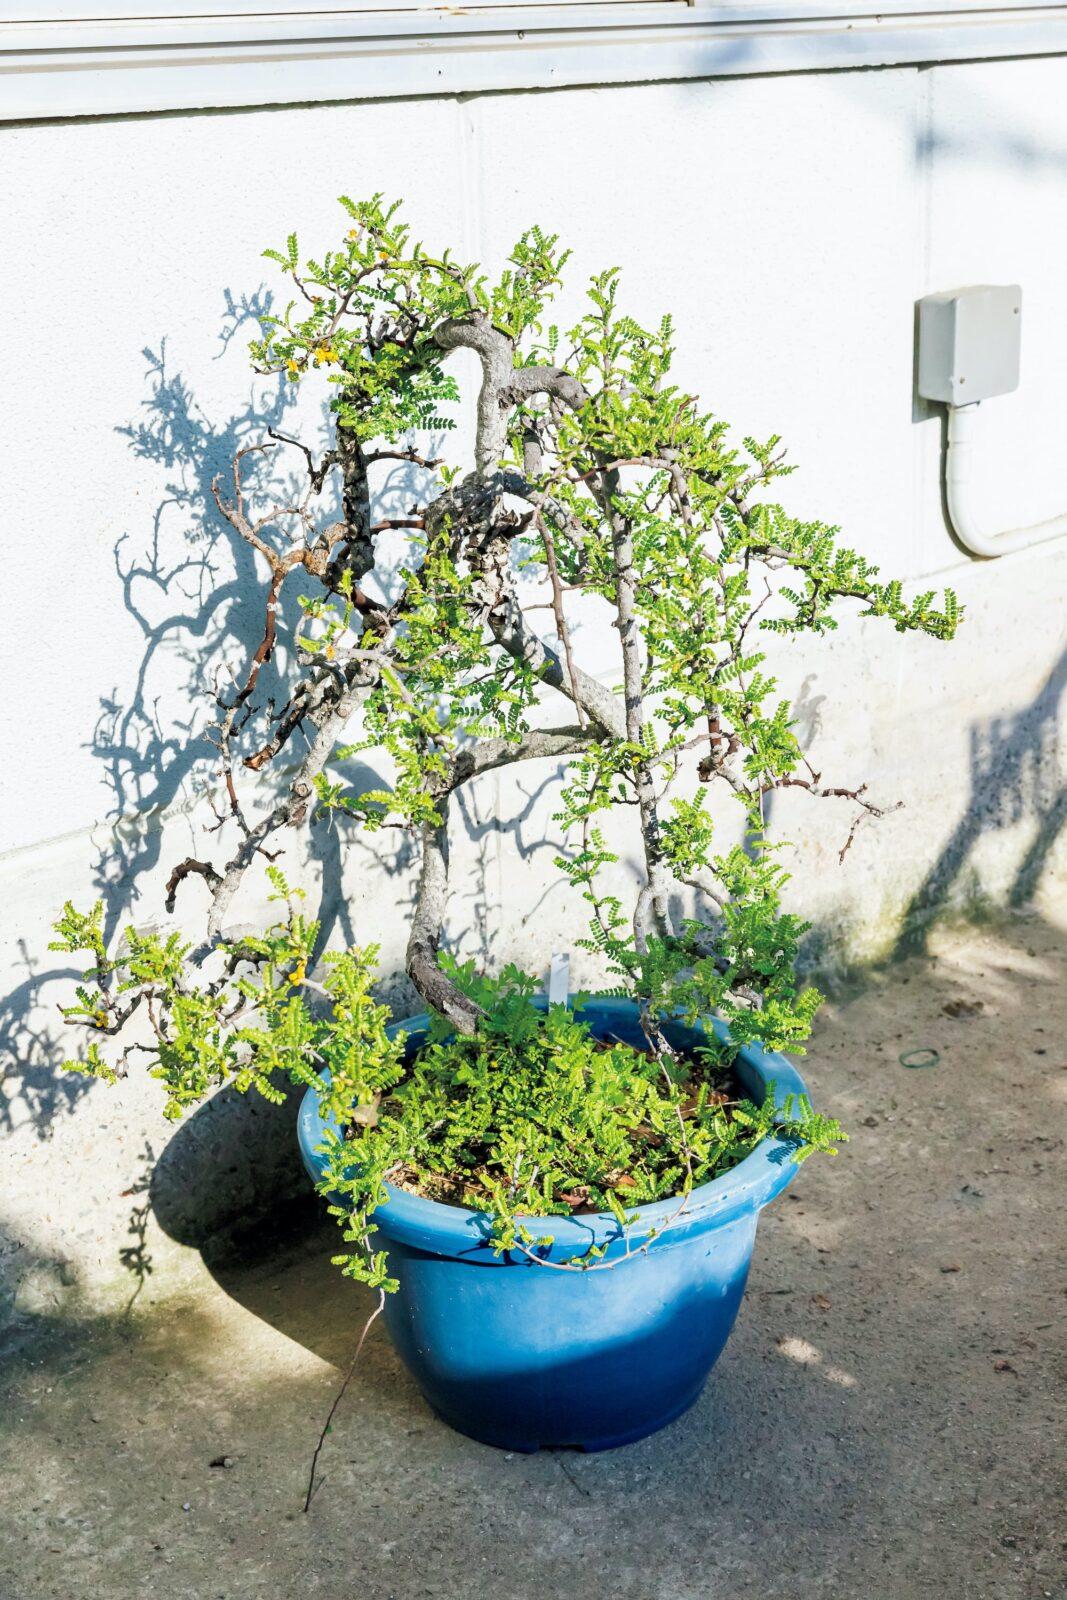 Osteomeles subrotunda/オステオメレス サブロツンダオペルクリカリアより断然良い!今流行ってるオペルクリカリアより断然良いものと思うけどなぁ~、亜熱帯の海岸に自生しているが耐寒性はありマイナス5~6℃あたりでも屋外で越しているで……。現在は野生種の採取は禁止されている。この木は規制前に現地の人が手に入れたもの。和名は天皇梅。